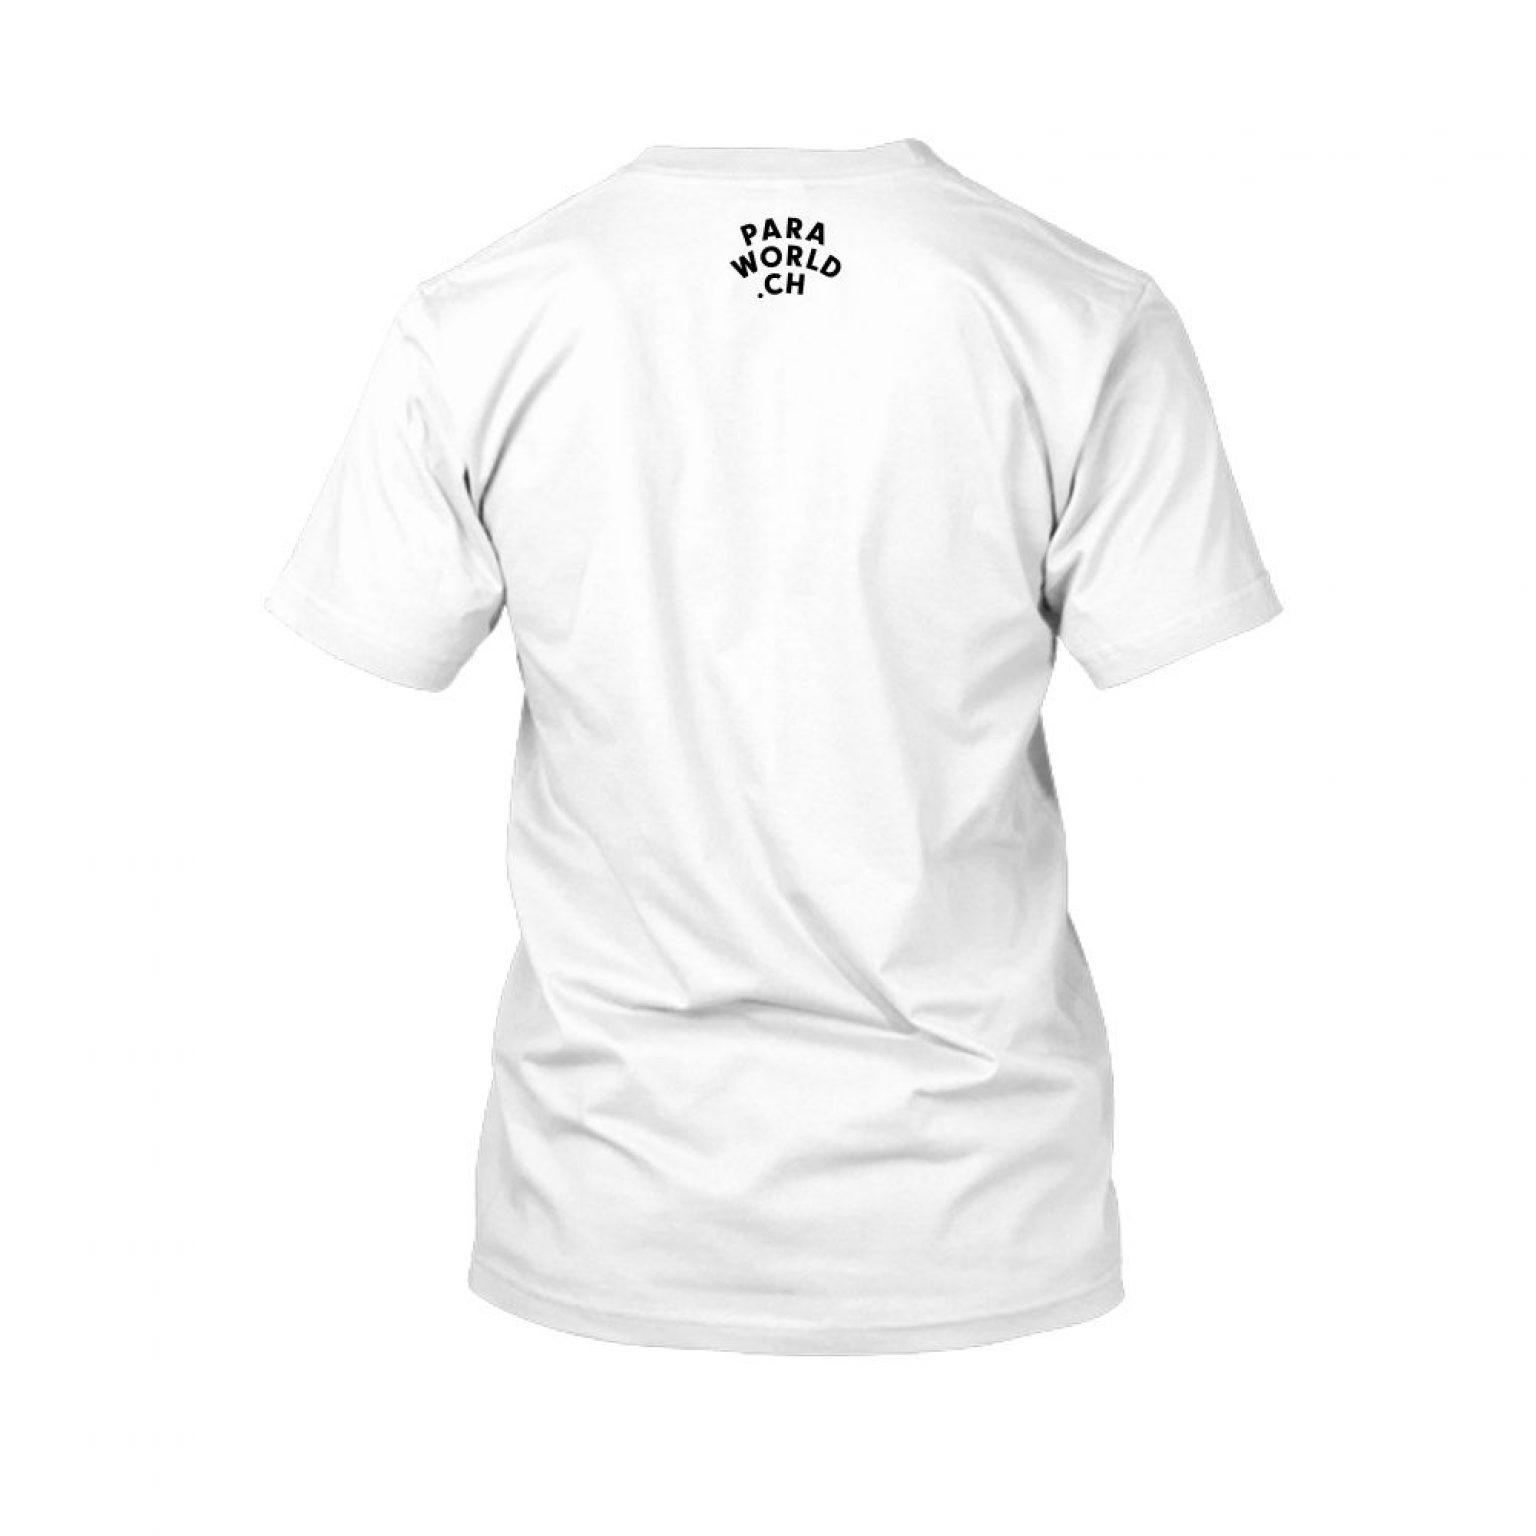 JTA s black shirt herren white back